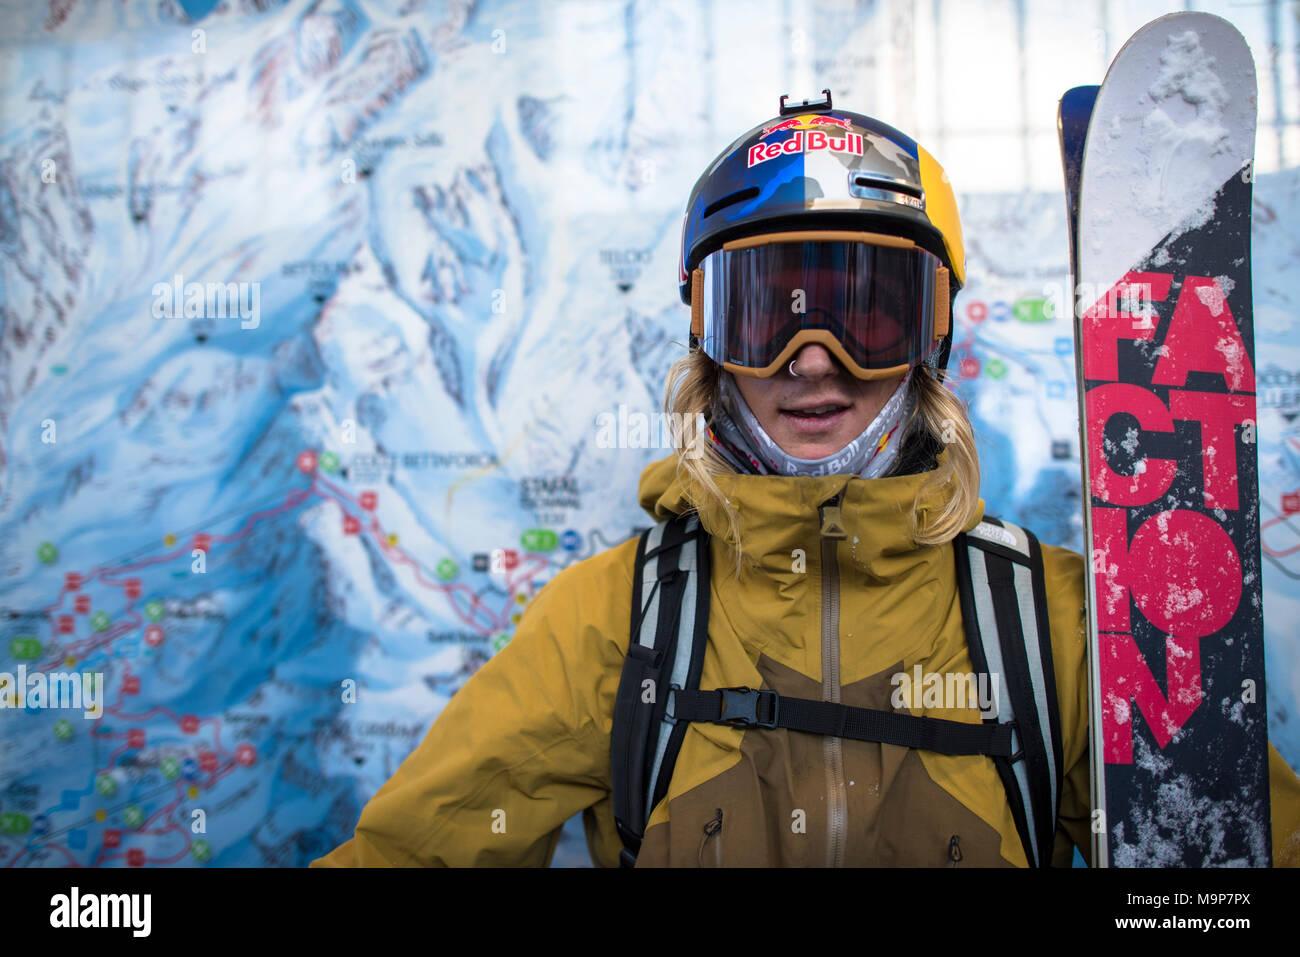 Portrait of skier in skiwear,  Monterosa Ski mountain resort in Gressoney, Aosta, Italy - Stock Image